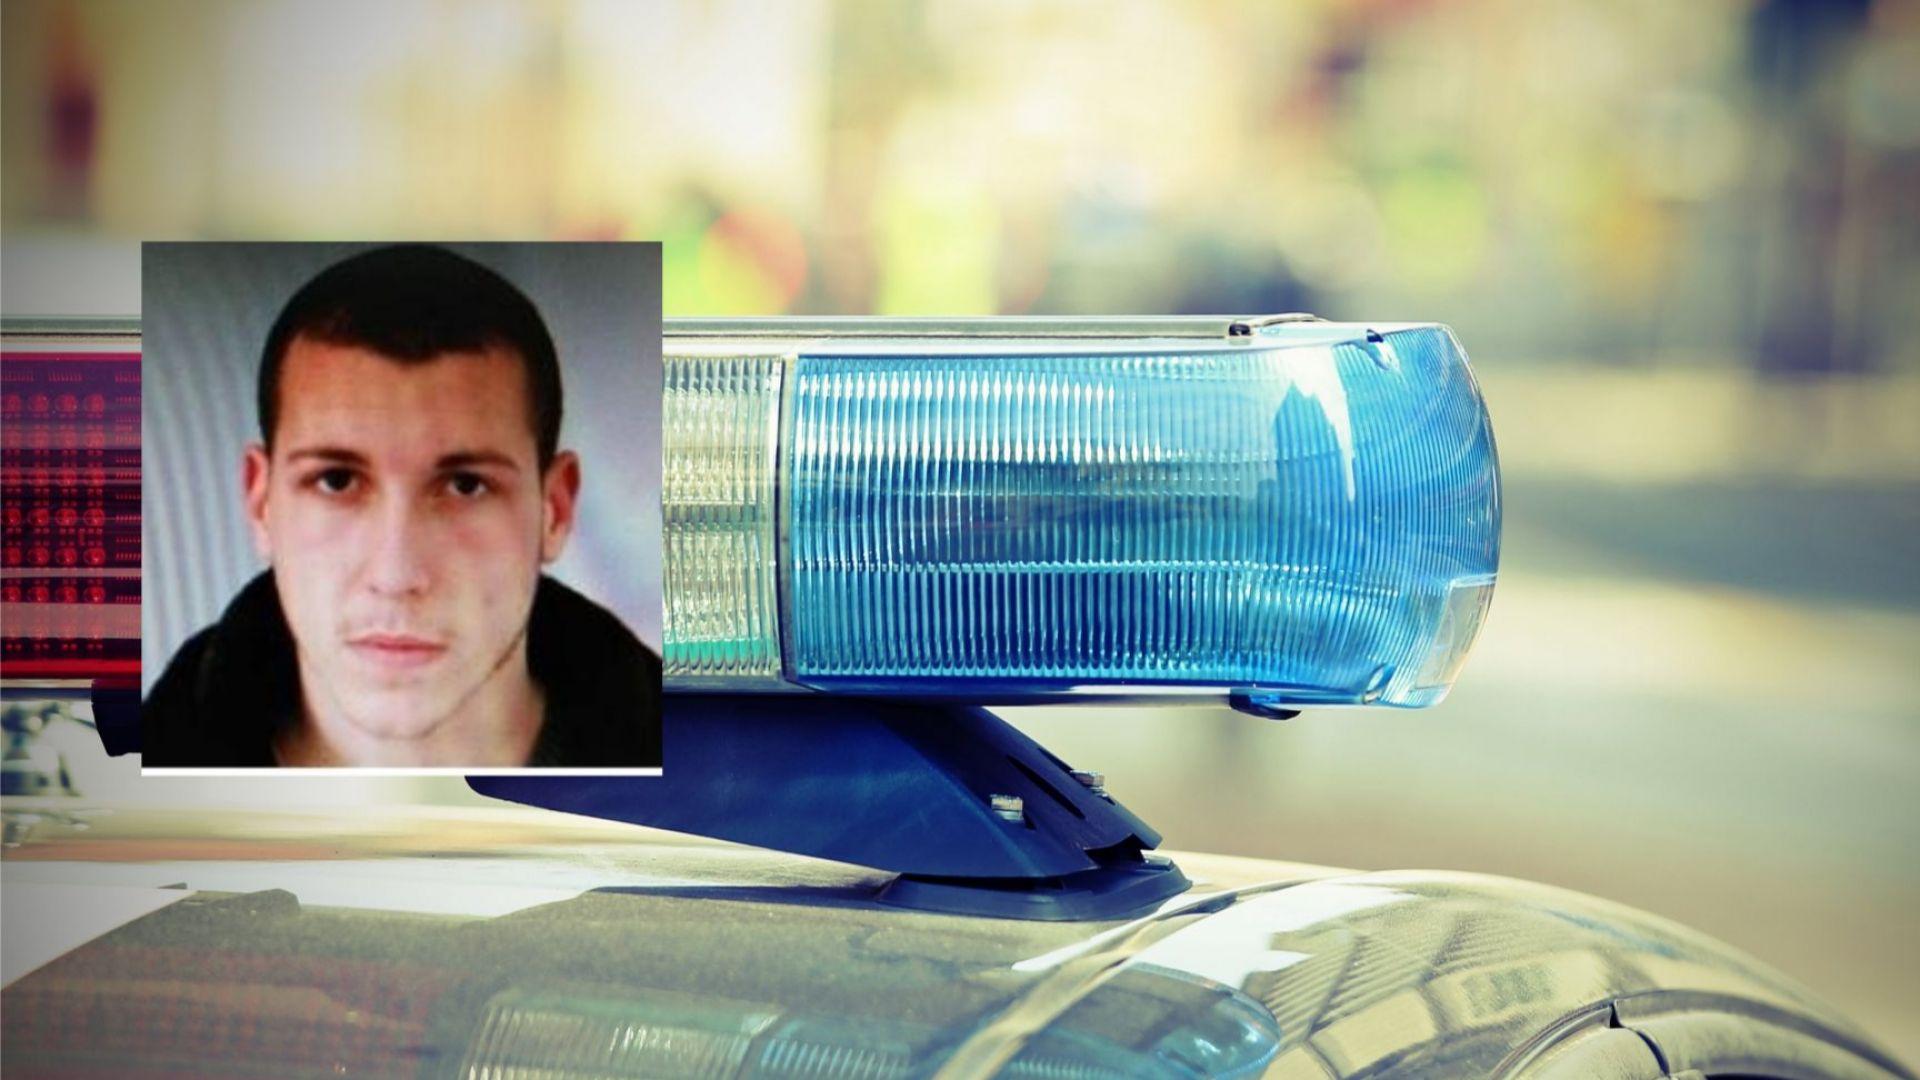 МВР издирва шофьор,  блъснал и ранил тежко полицай